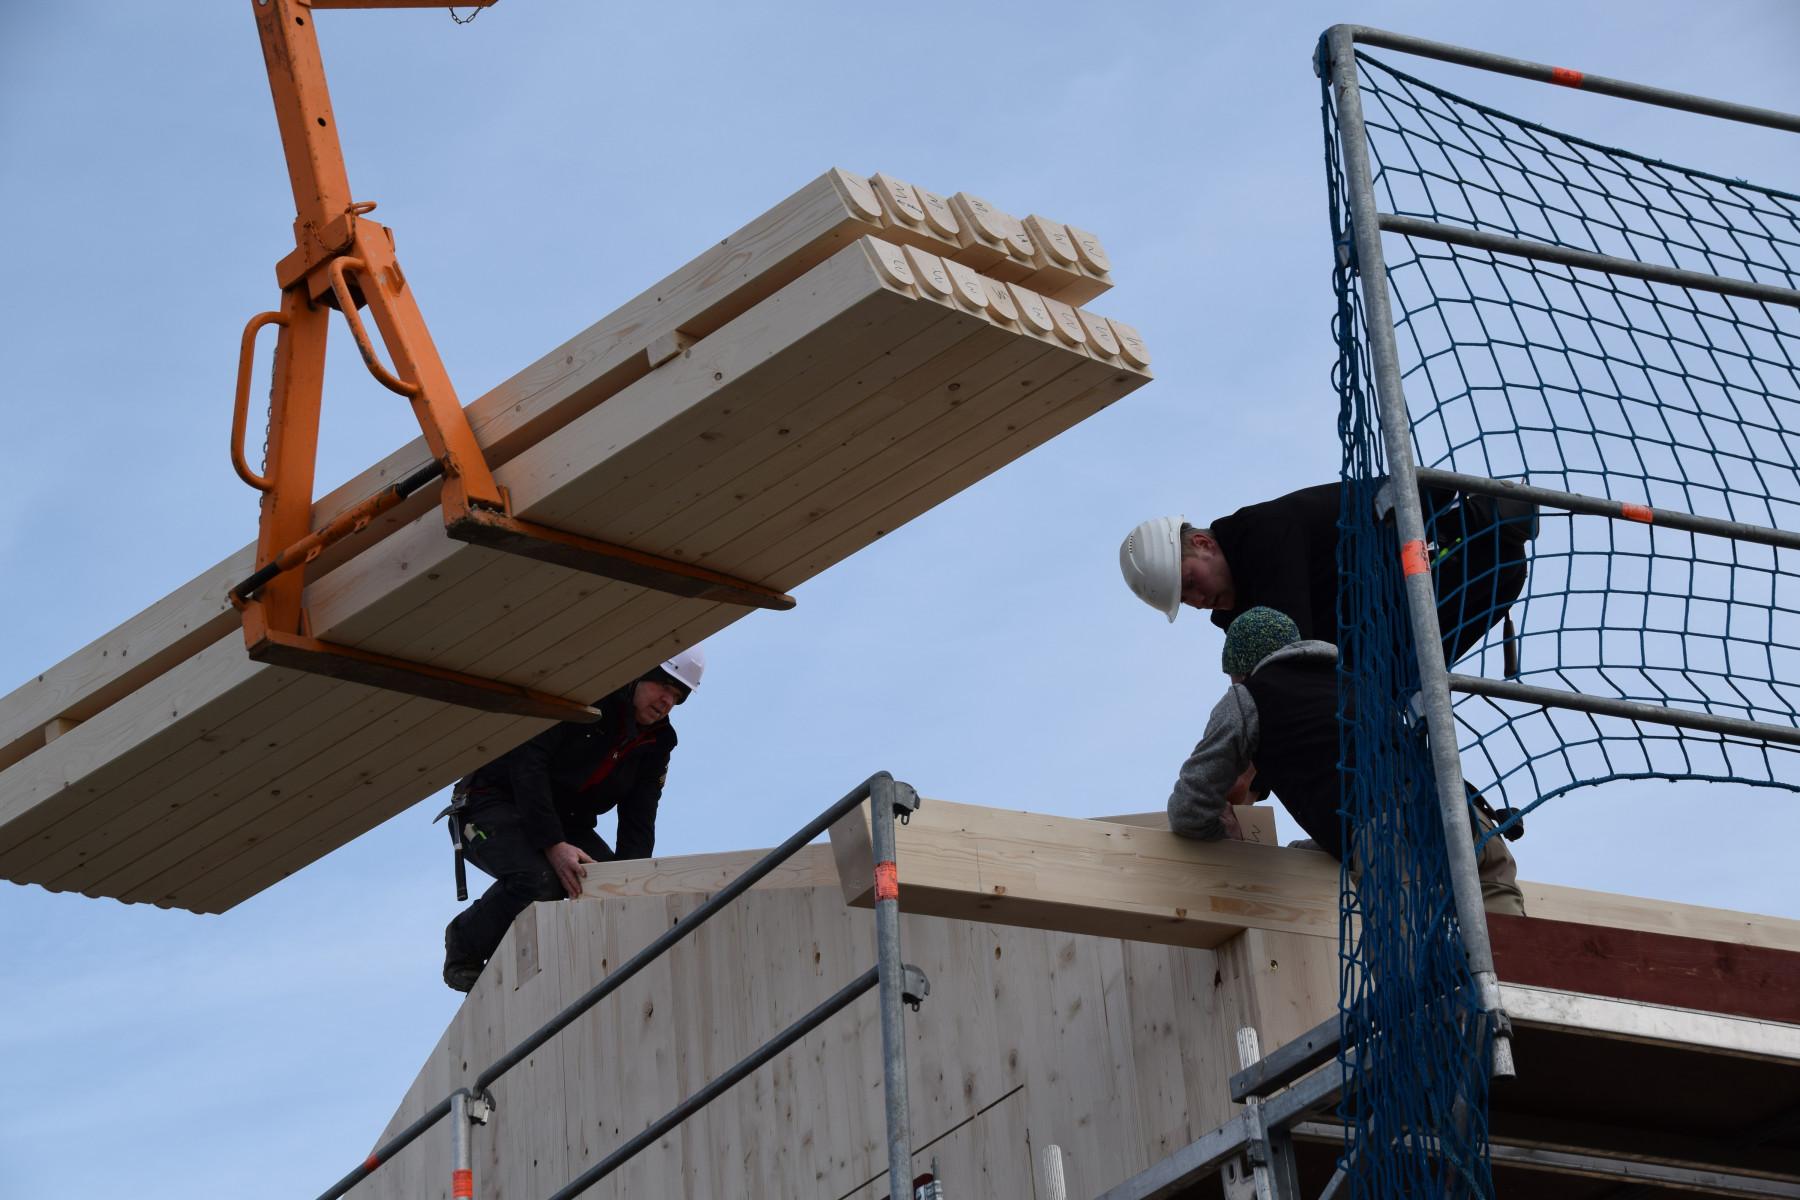 DSC_0762Strasser Holzbau Riedering.jpg